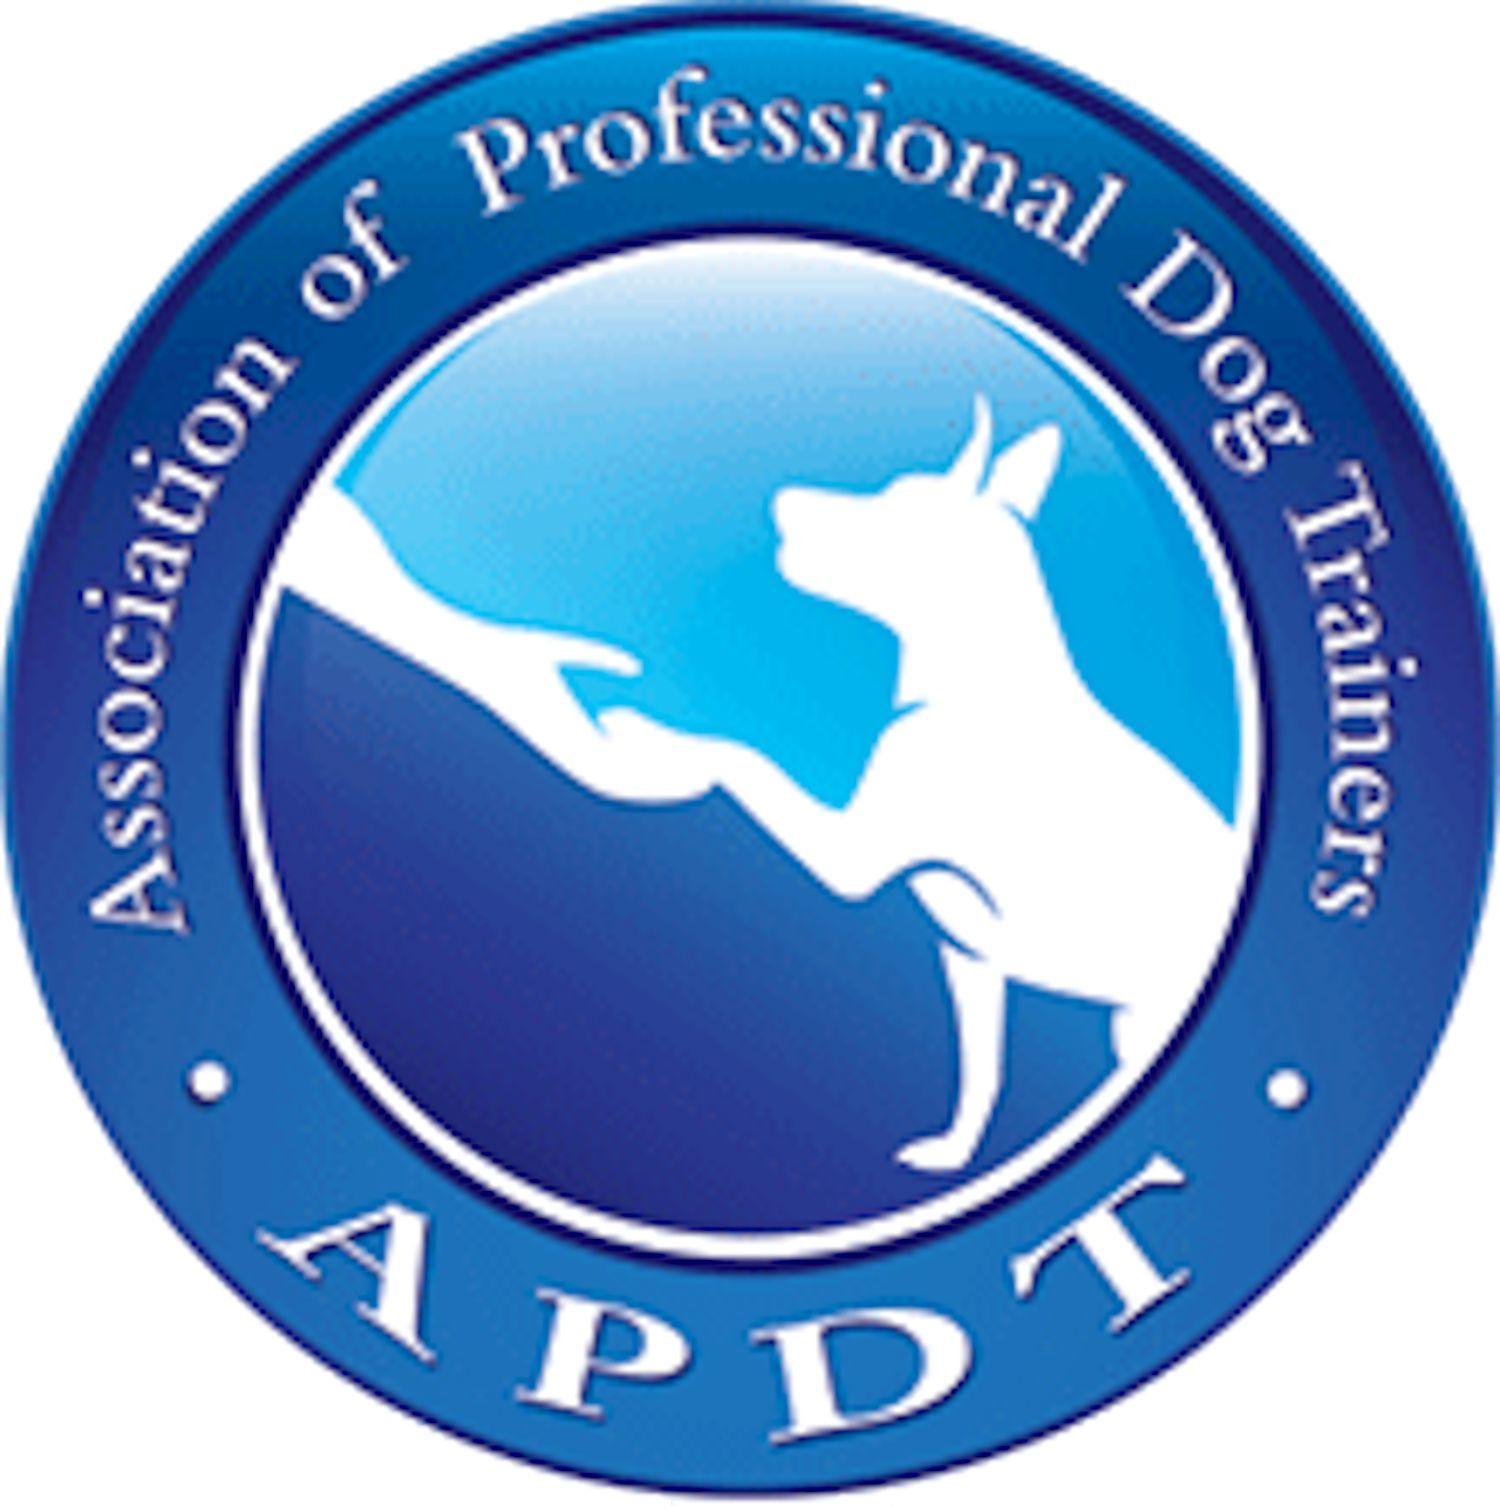 apdt_logo_prof 02